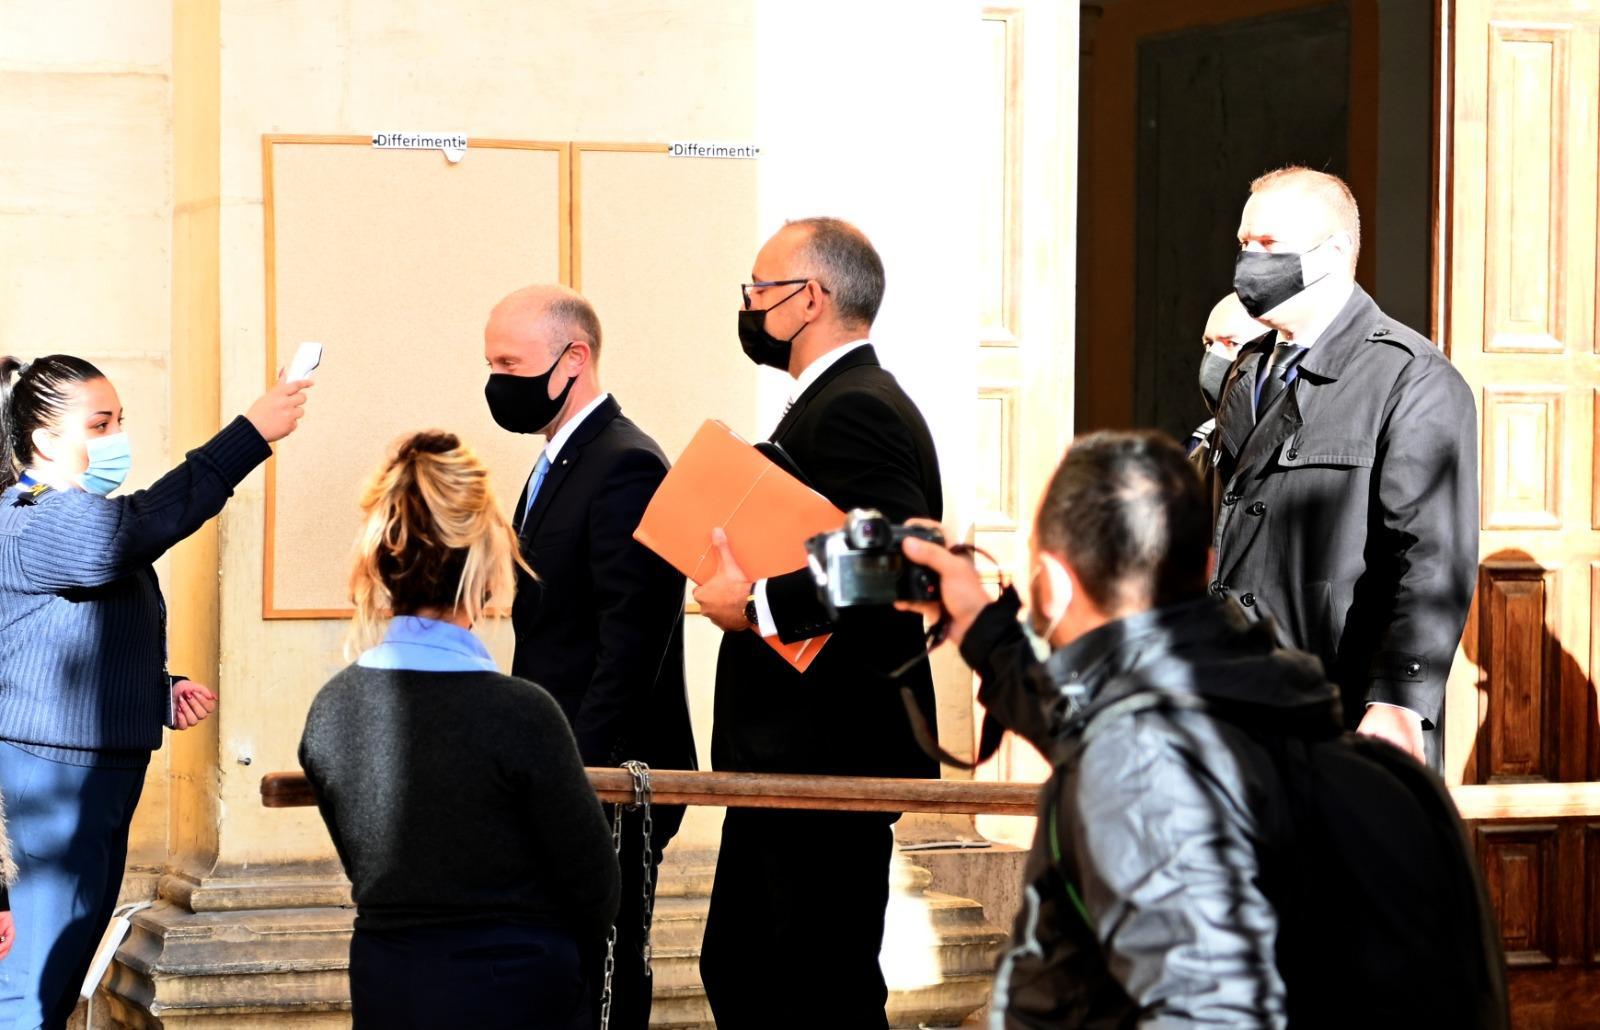 Joseph Muscat makes his way into court. Photo: Mark Zammit Cordina